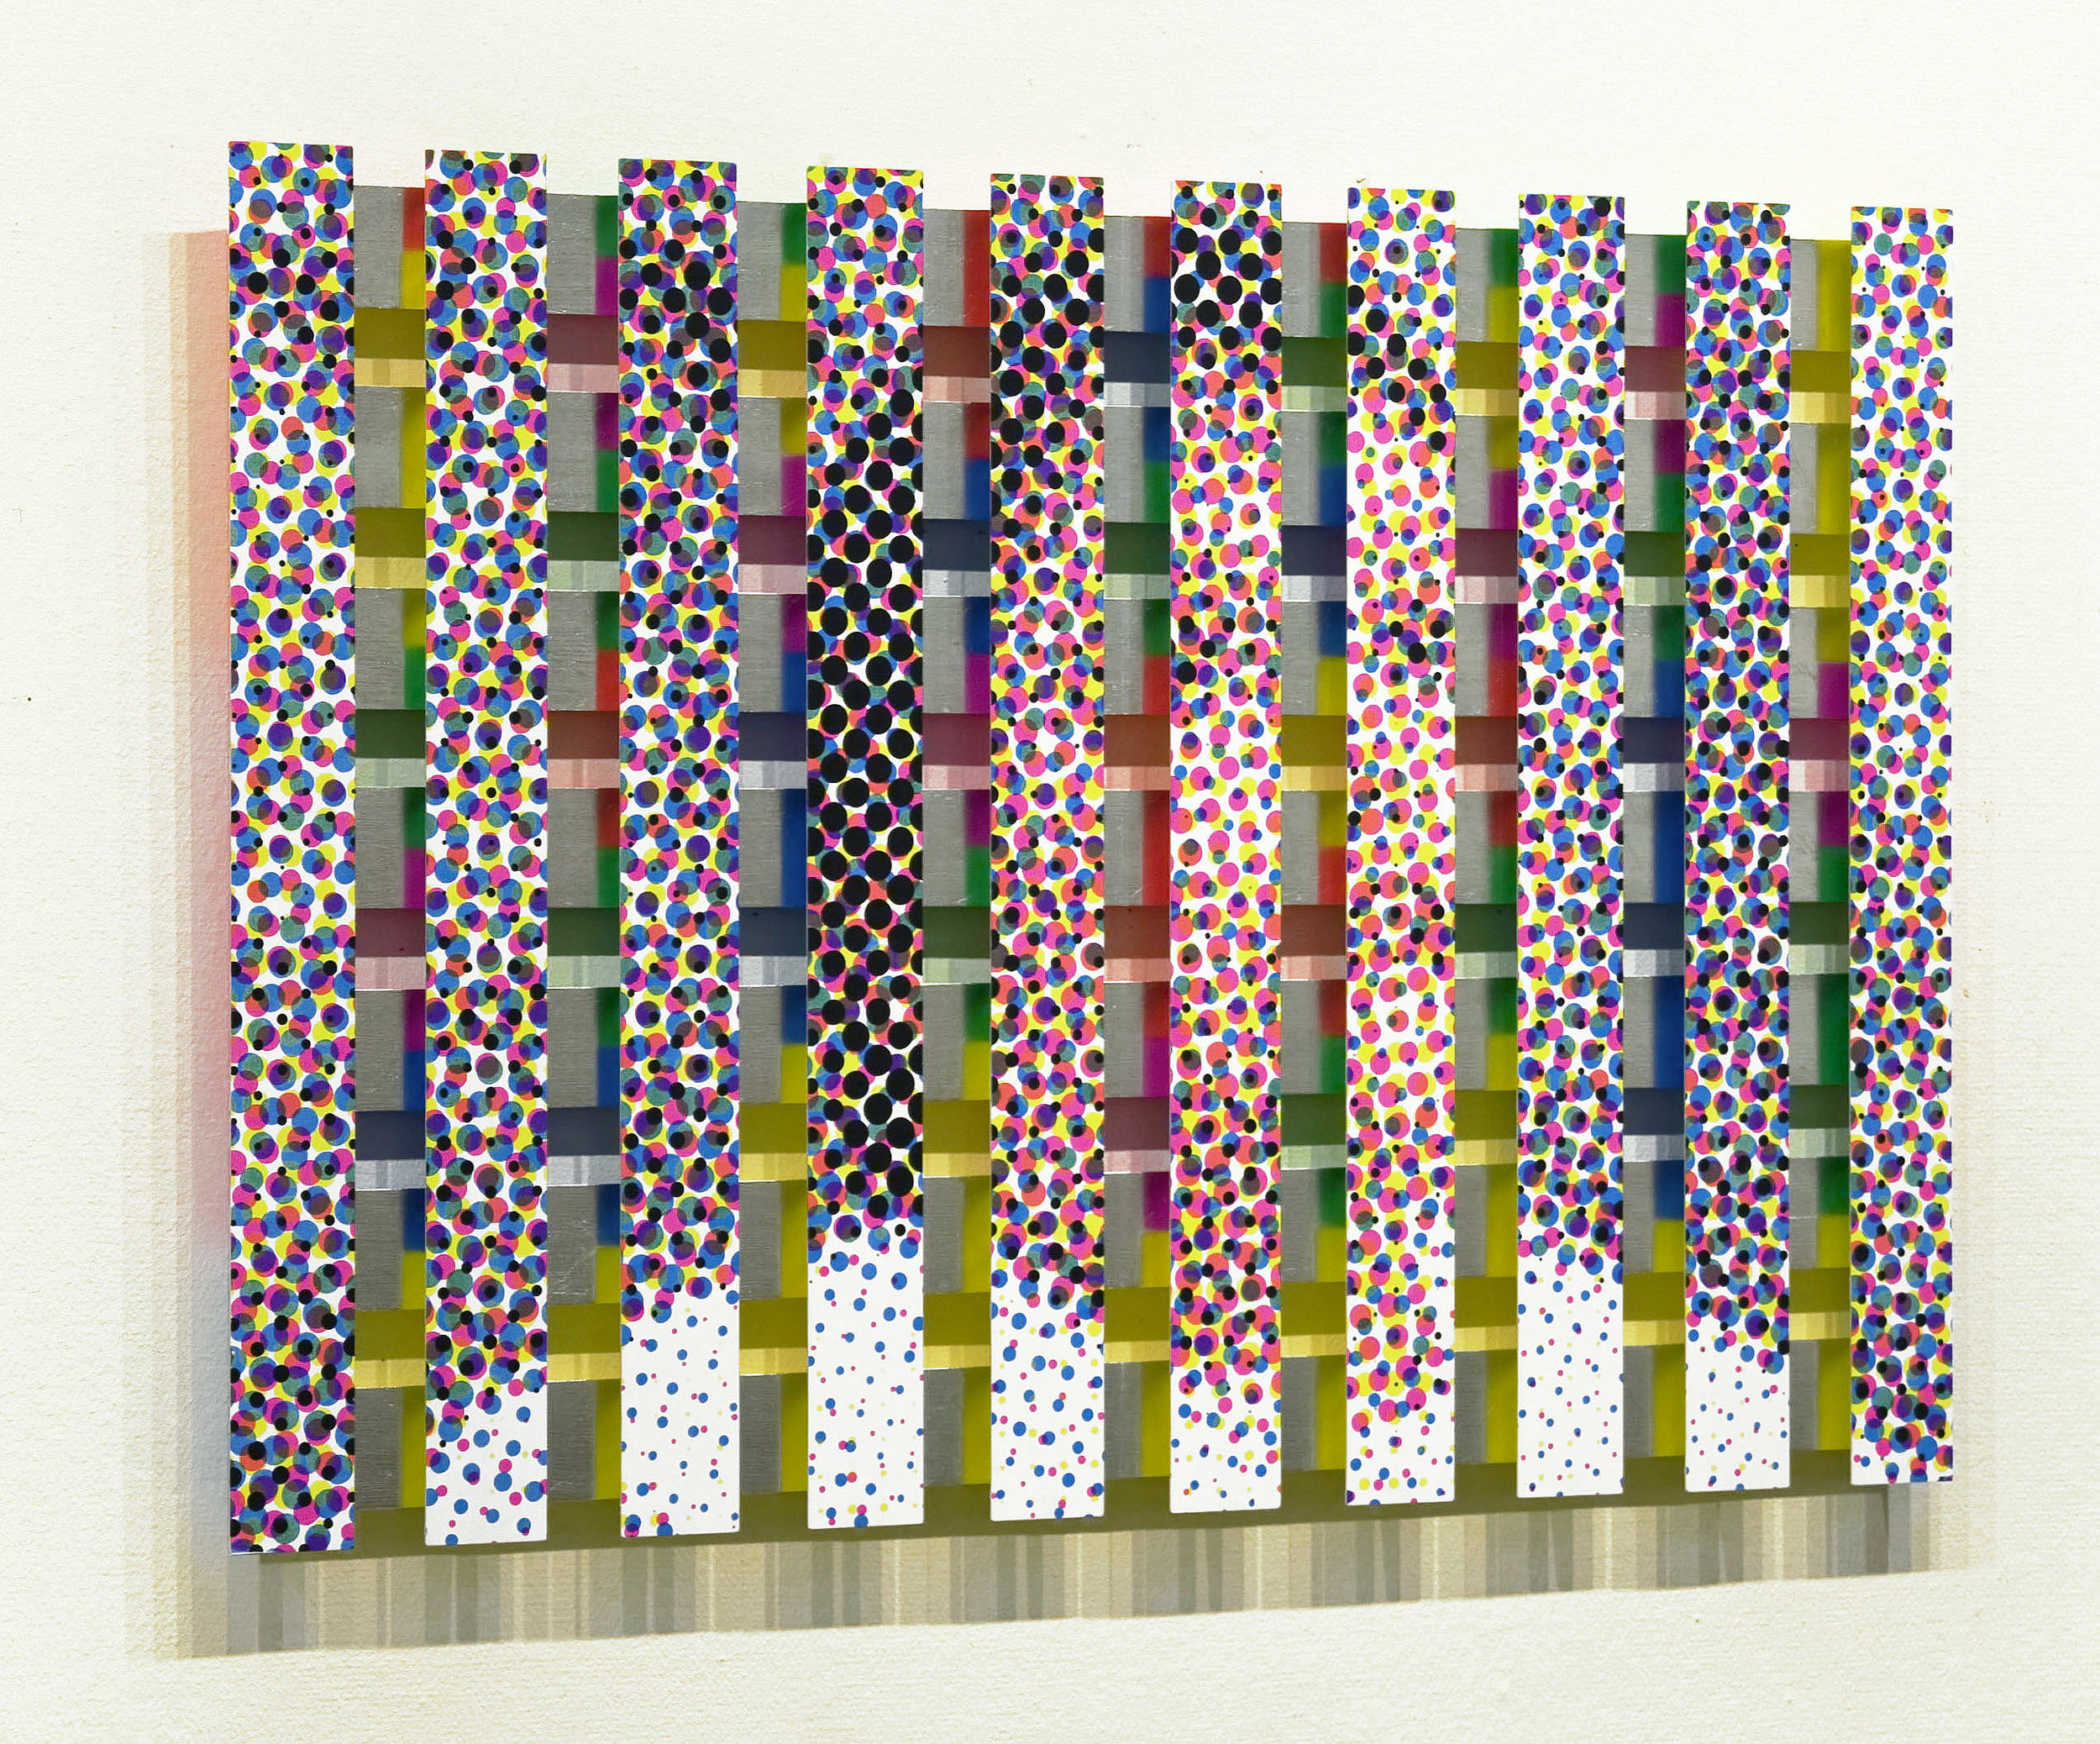 5b akril, les, 96 x 135 cm, 2011.jpg